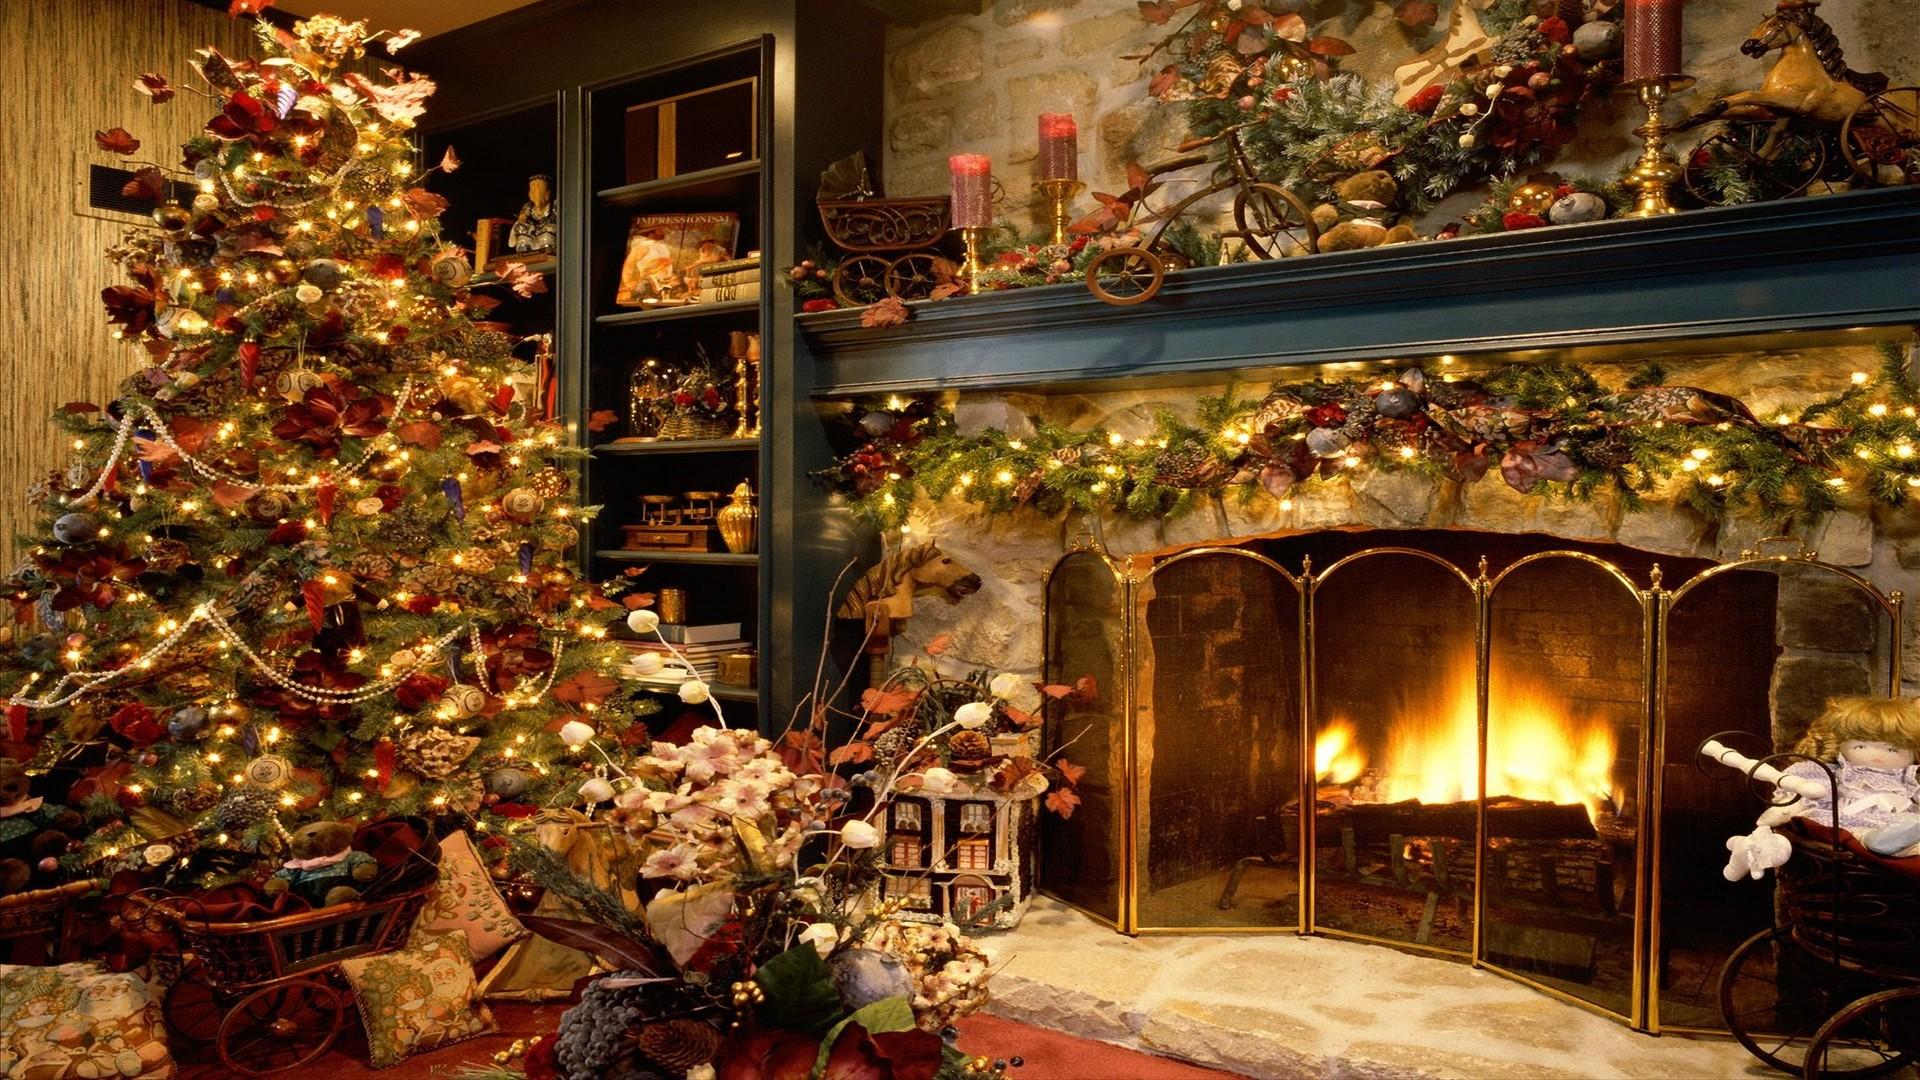 1920x1080 Christmas Wallpaper